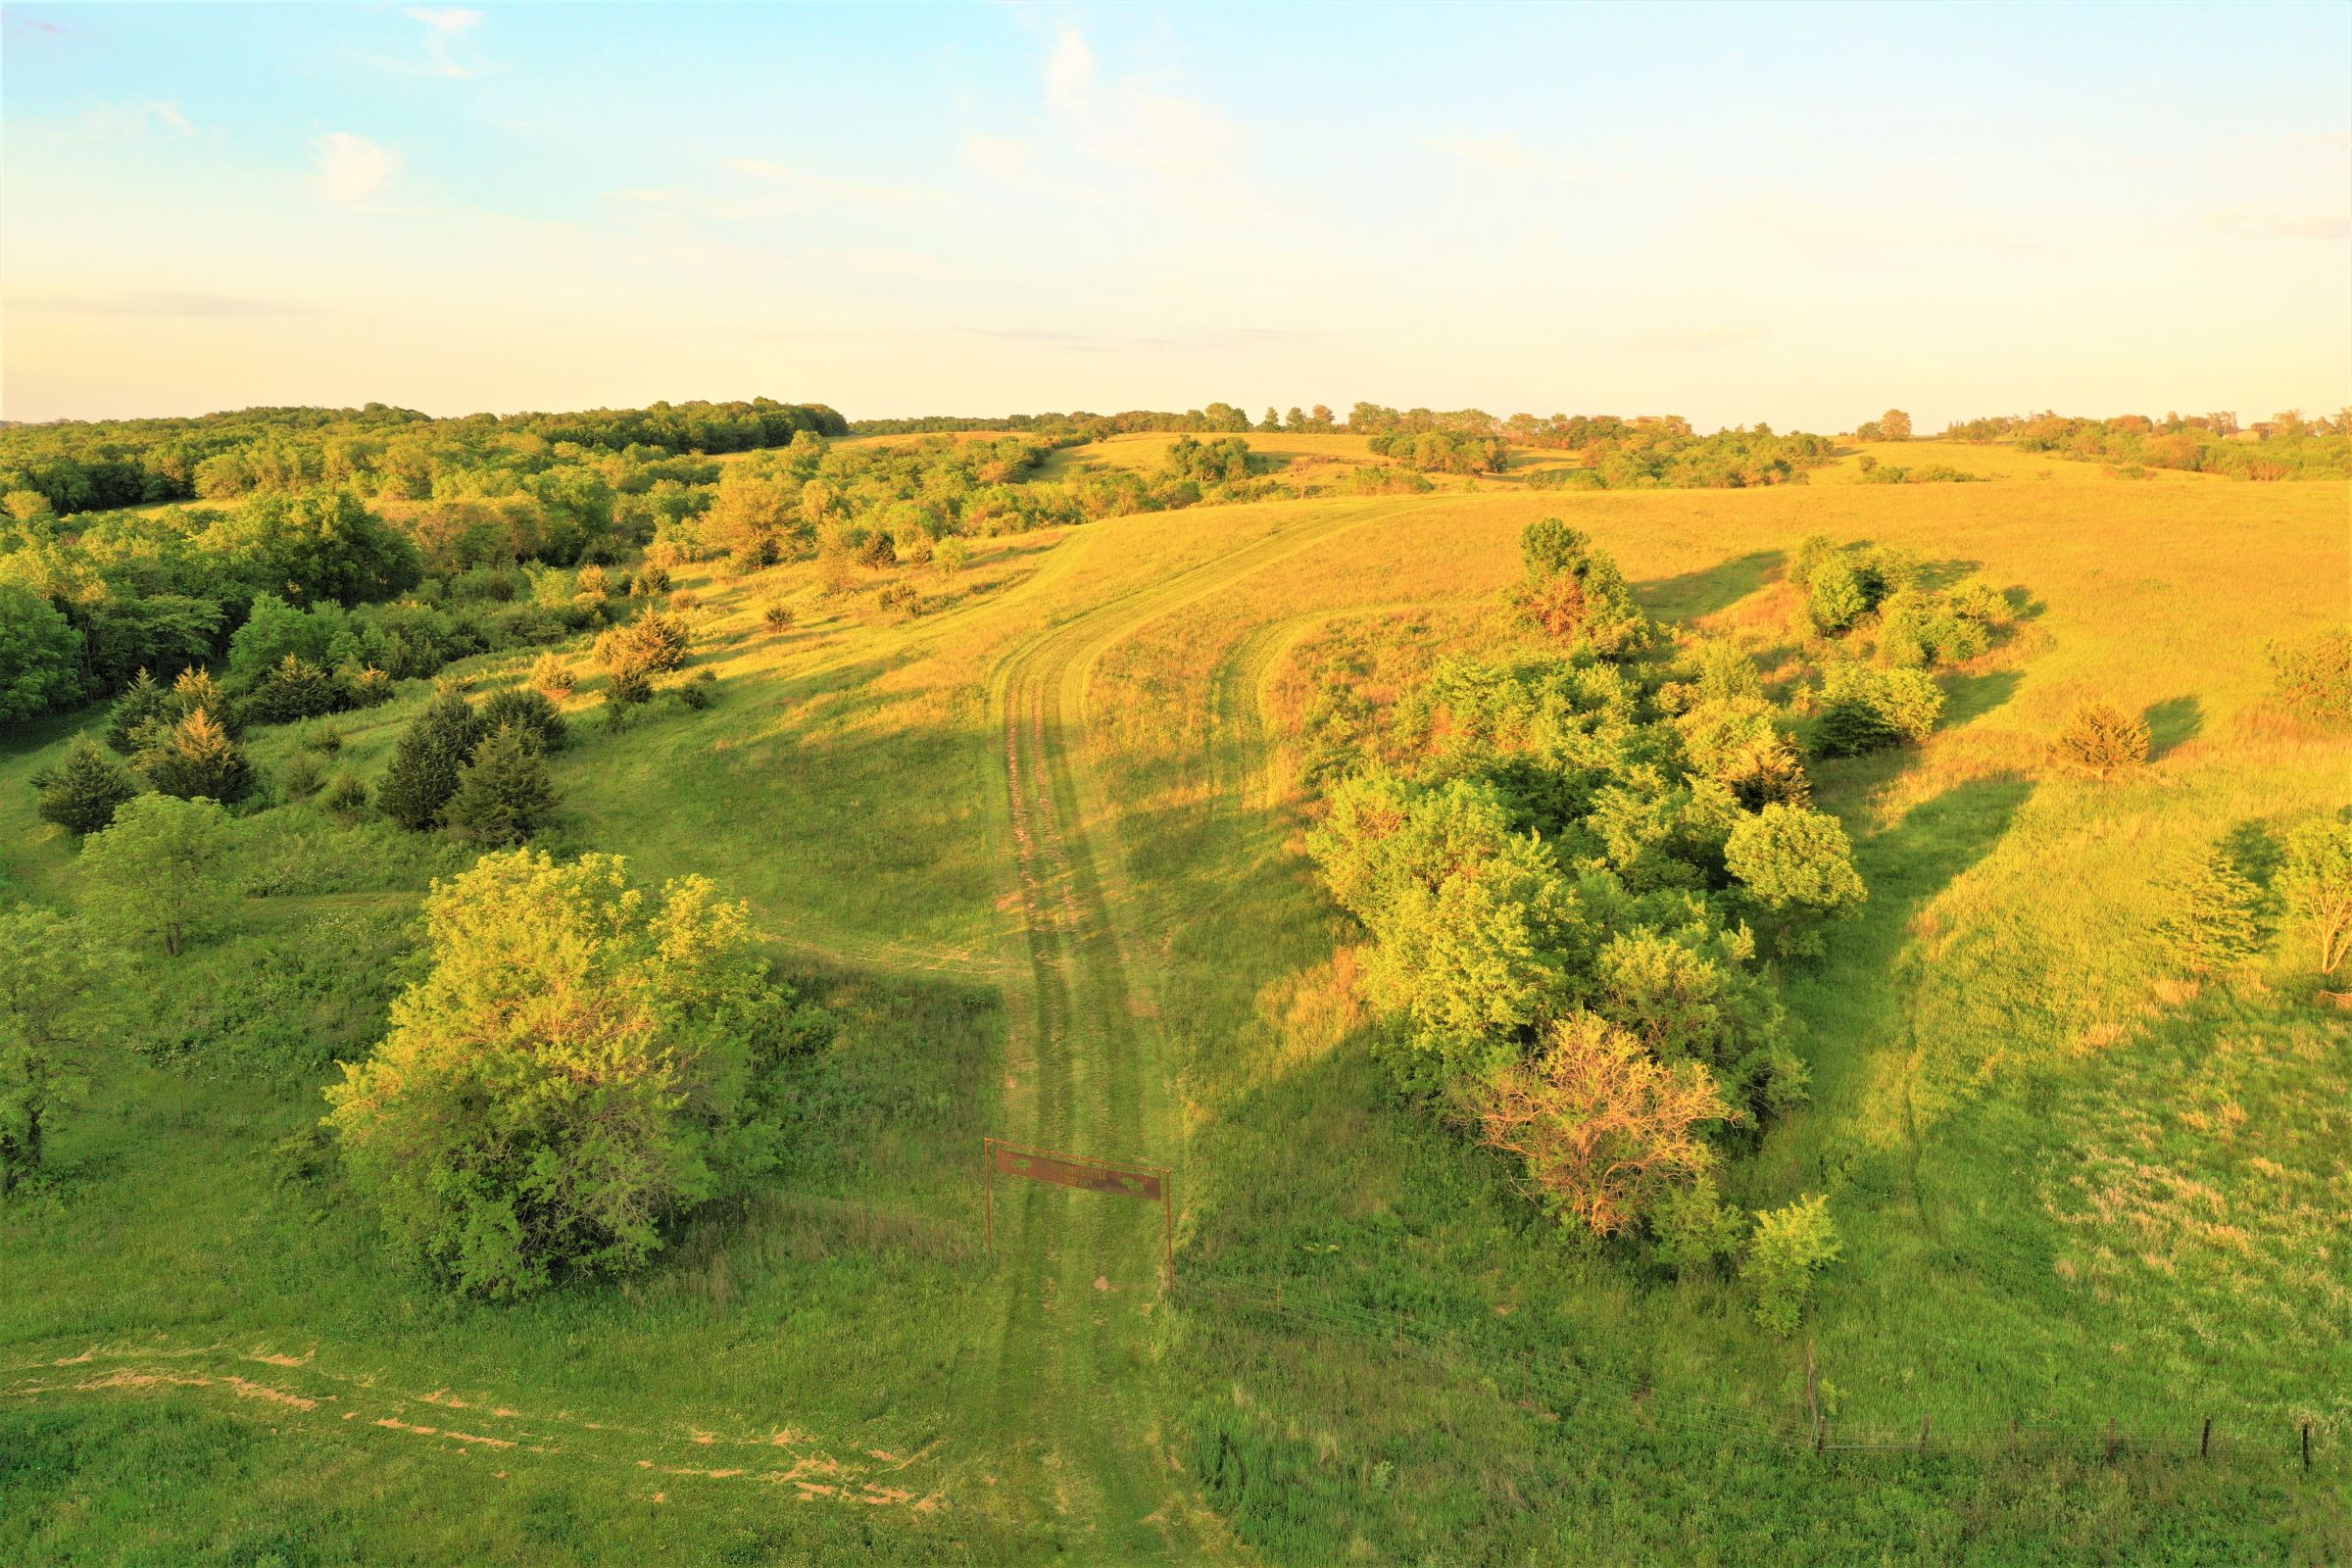 land-madison-county-iowa-71-acres-listing-number-15542-9-2021-08-05-185036.jpg